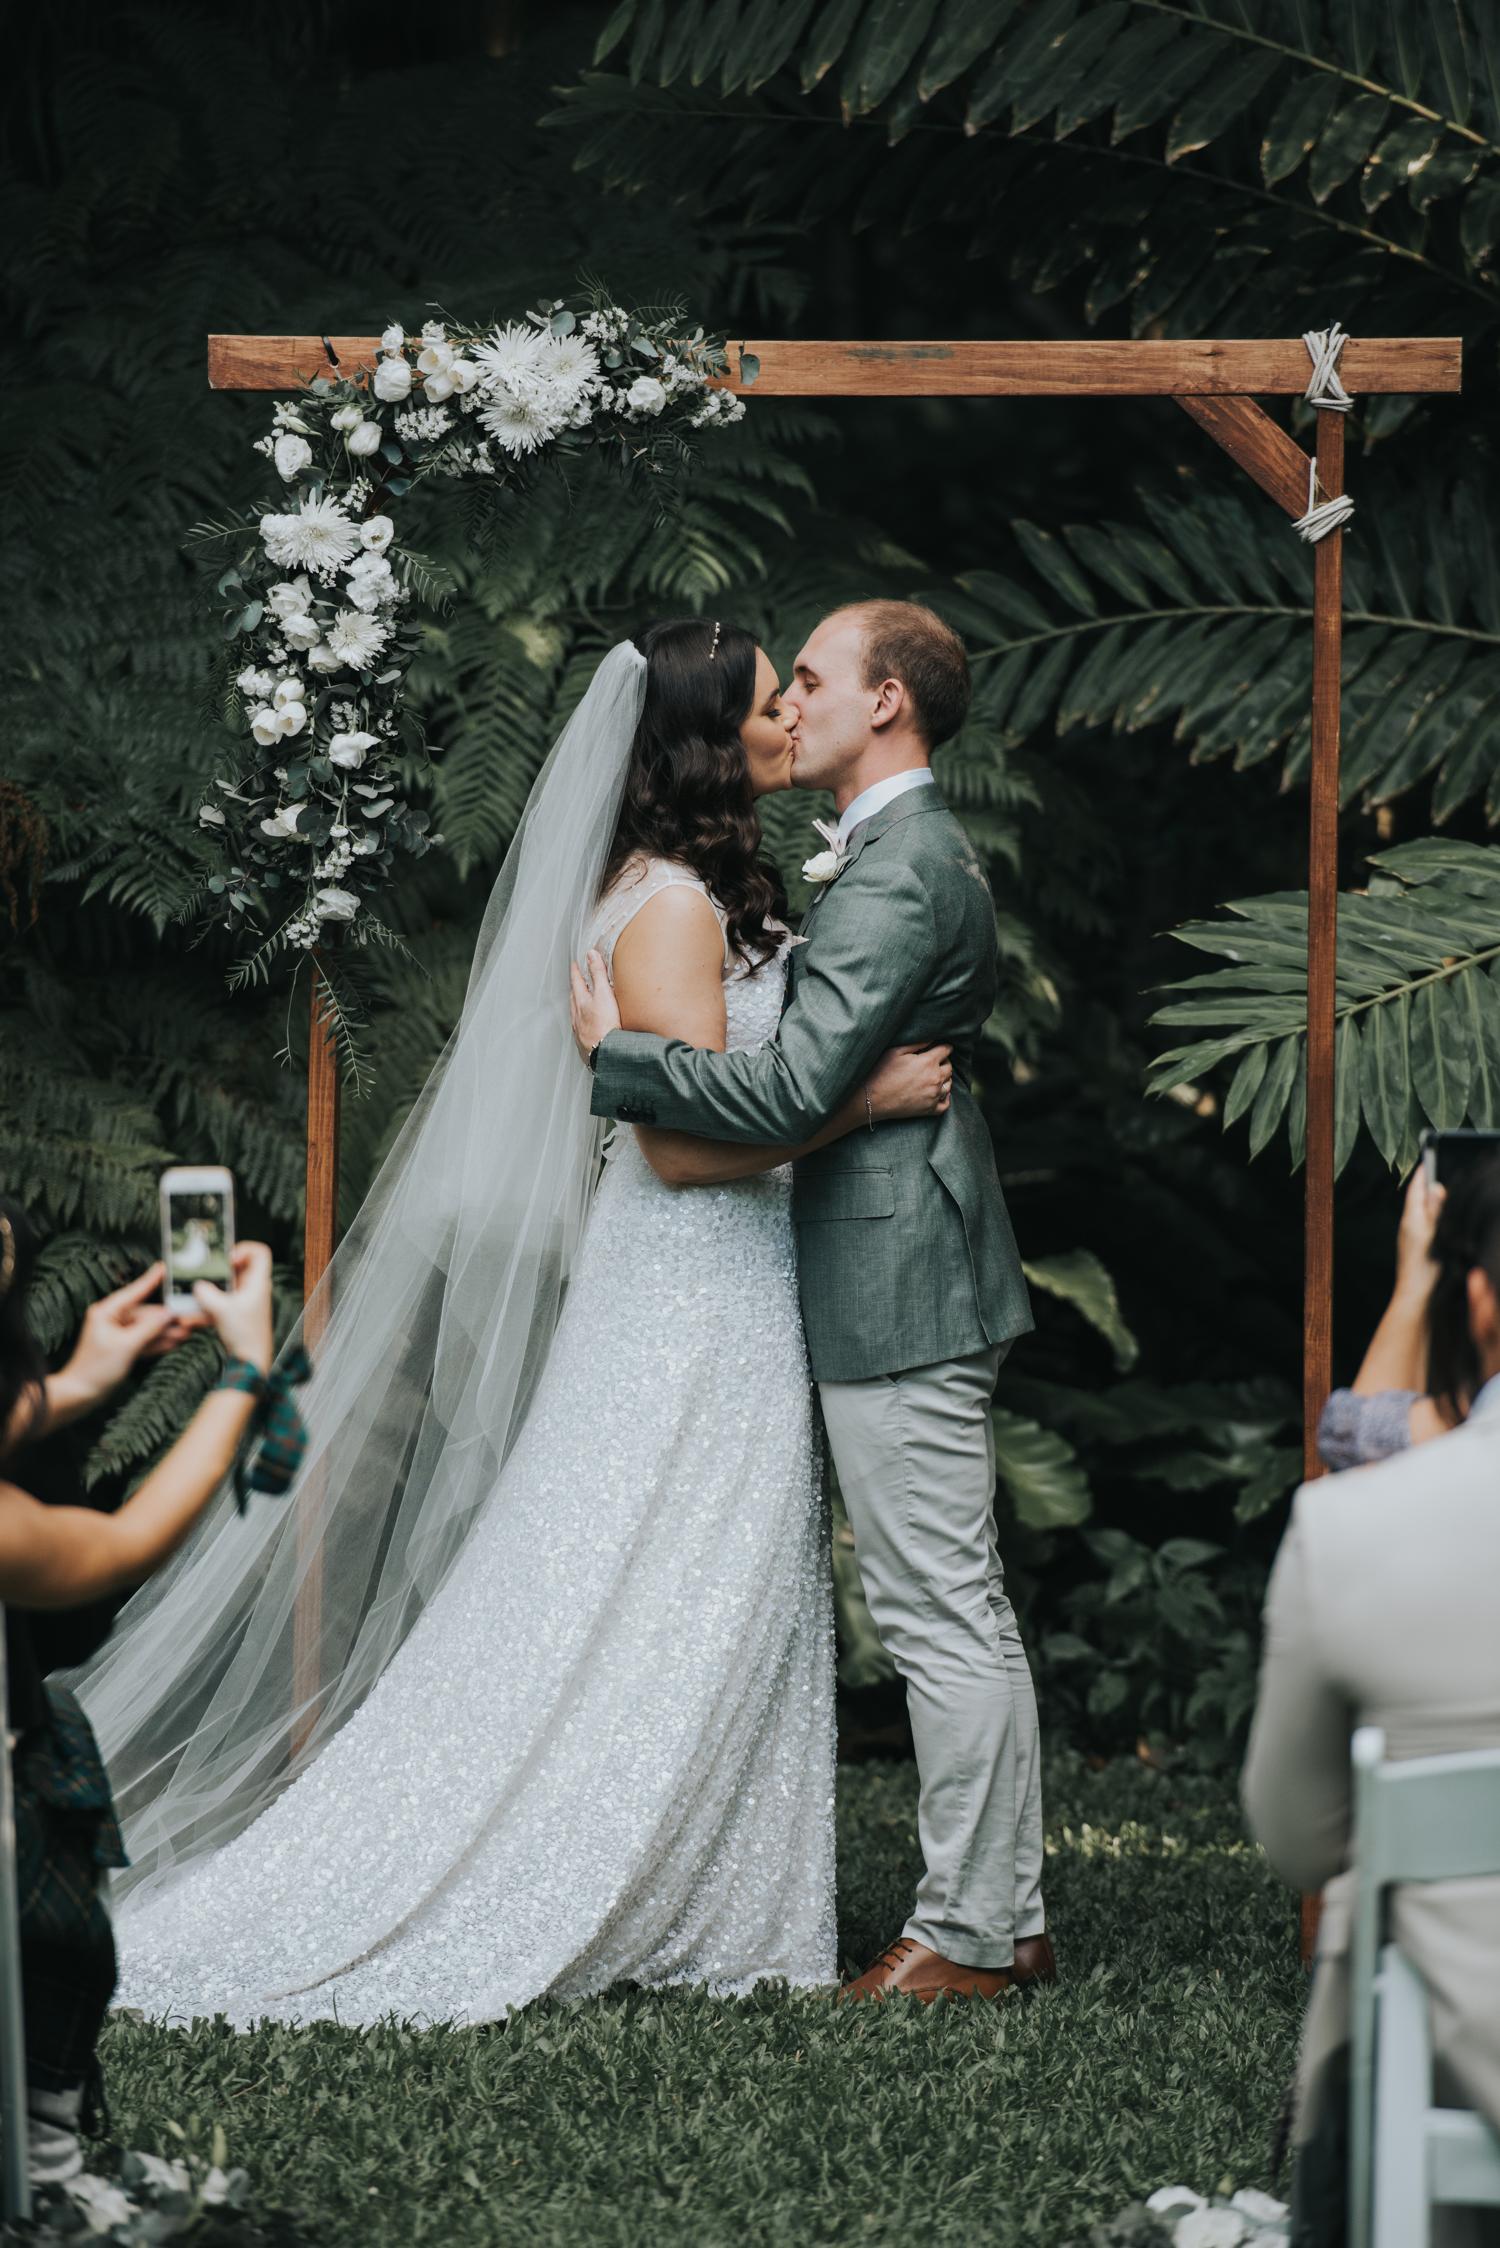 Brisbane Wedding Photographer | Beautiful intimate elopement photography-30.jpg